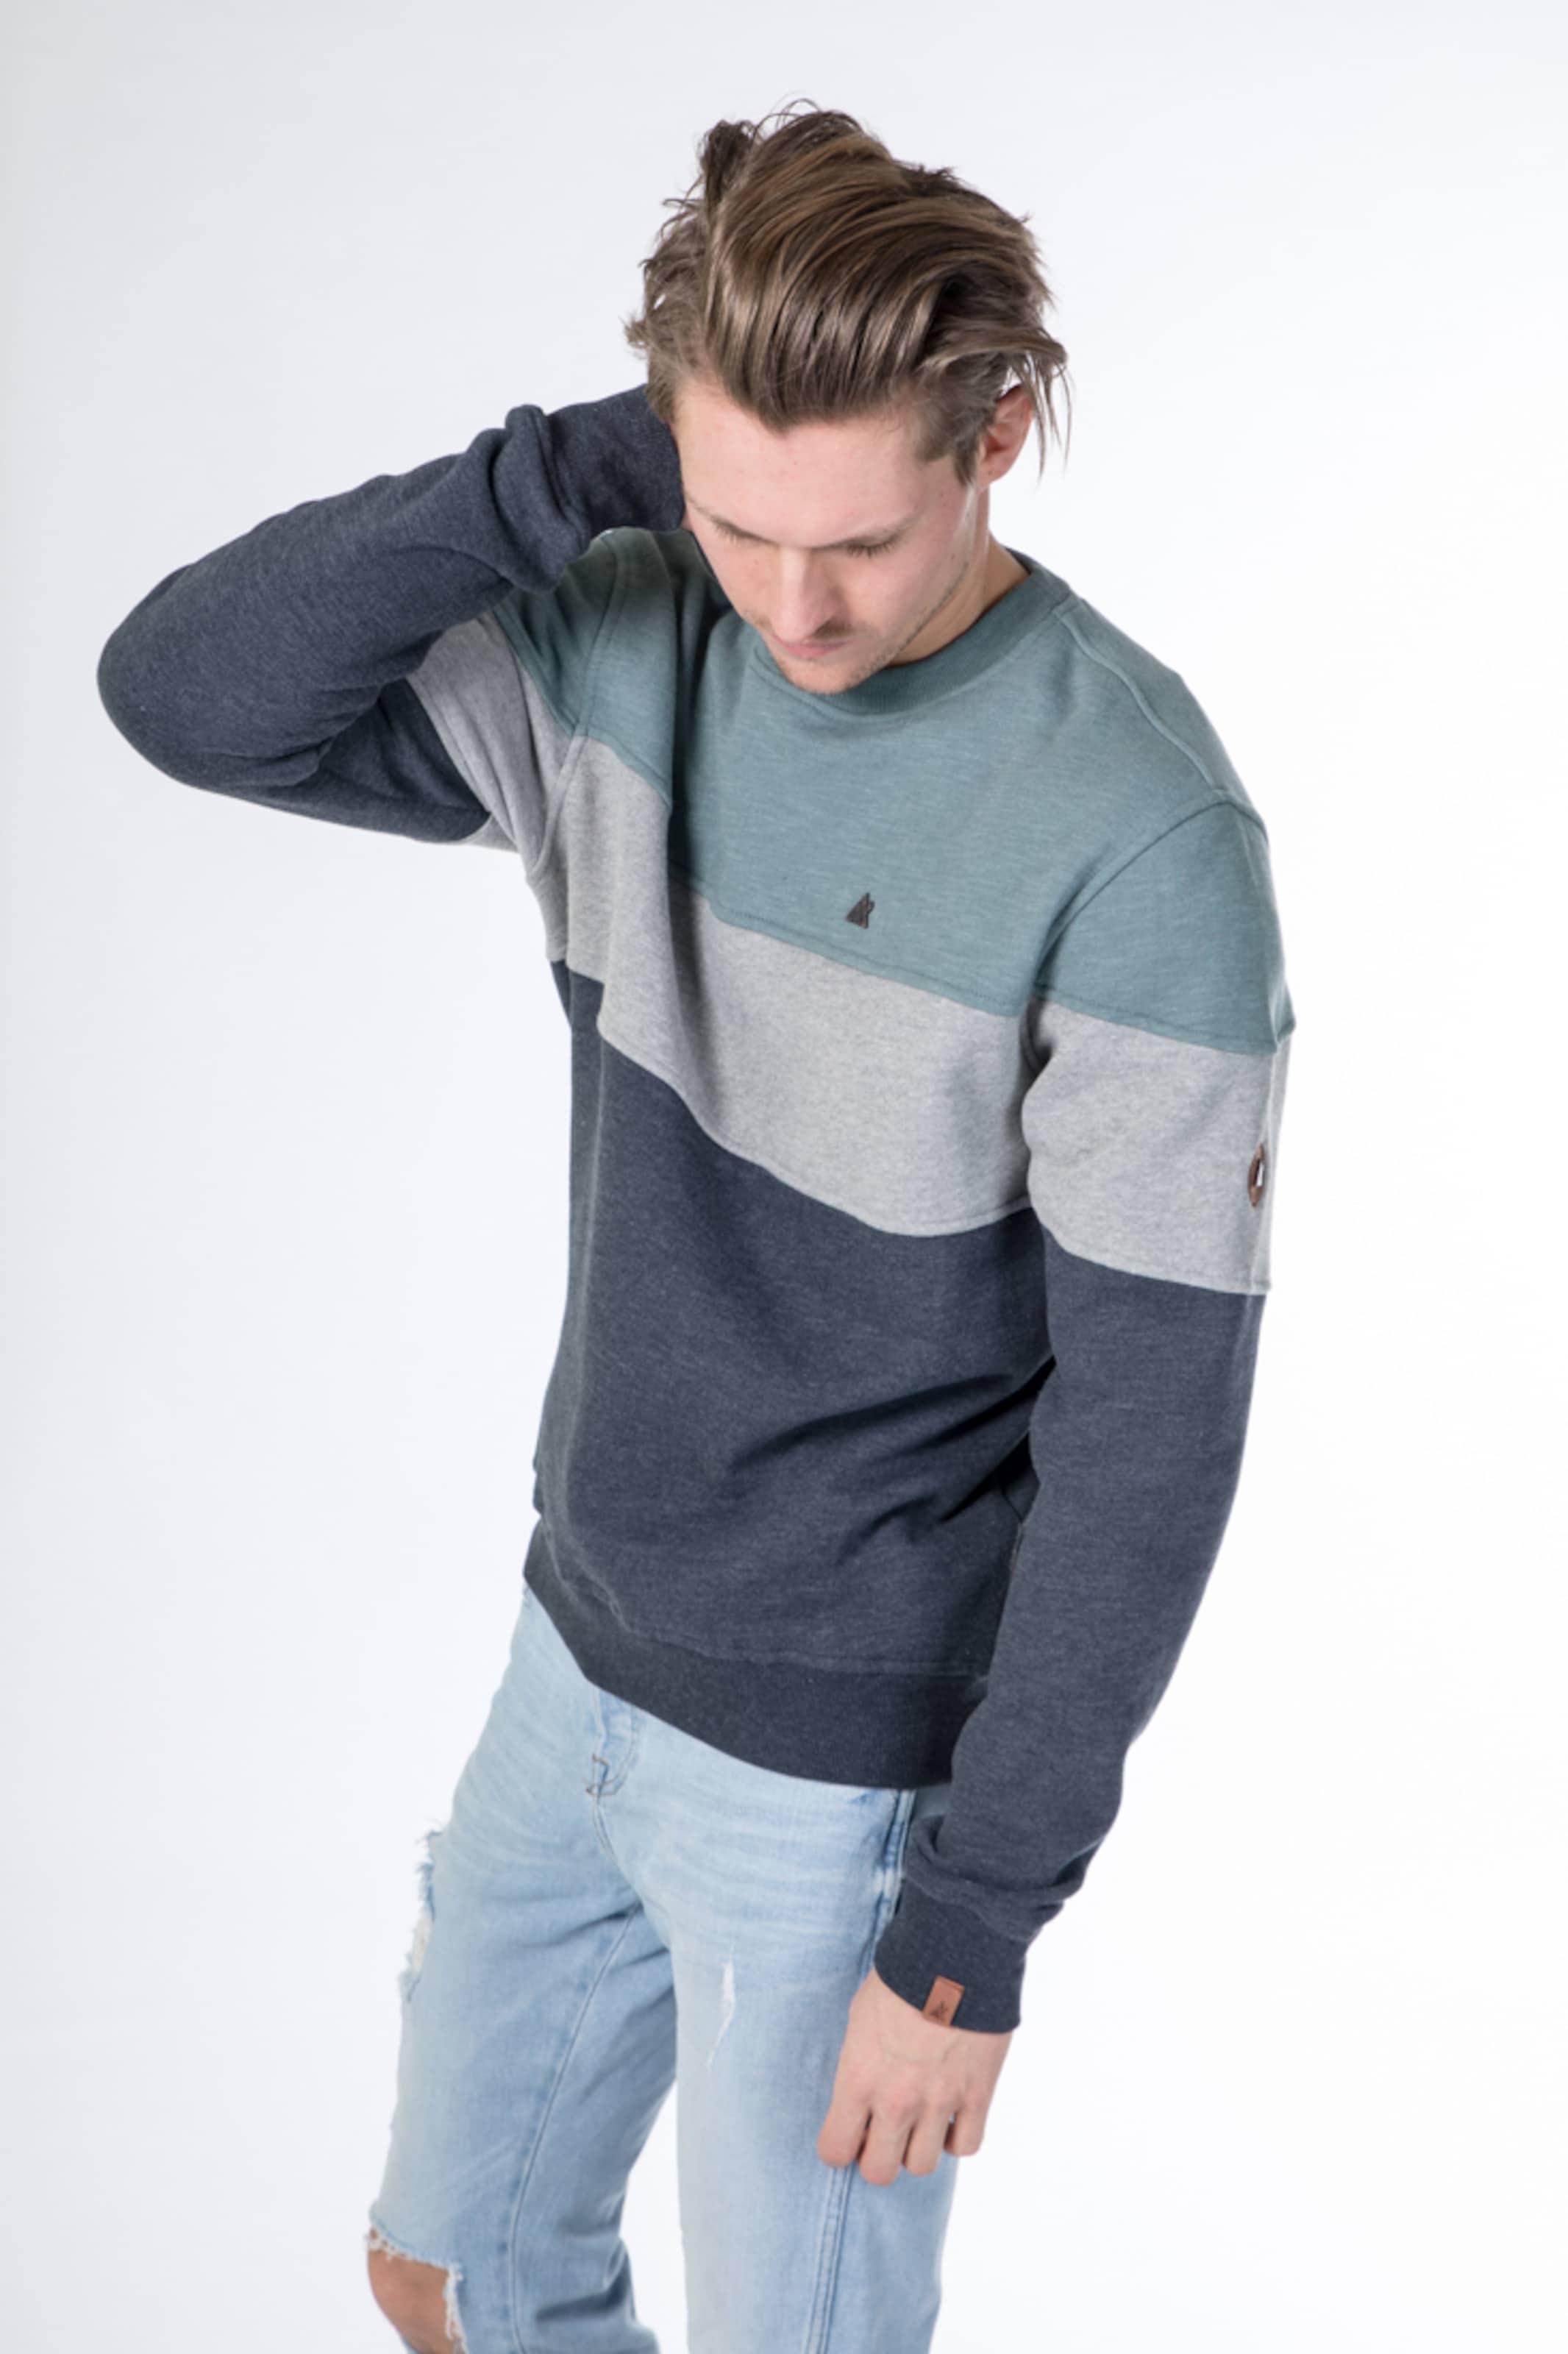 Hellgrau Kickin And OpalTaubenblau Alife 'vince' Sweatshirt In Owk08nPXN